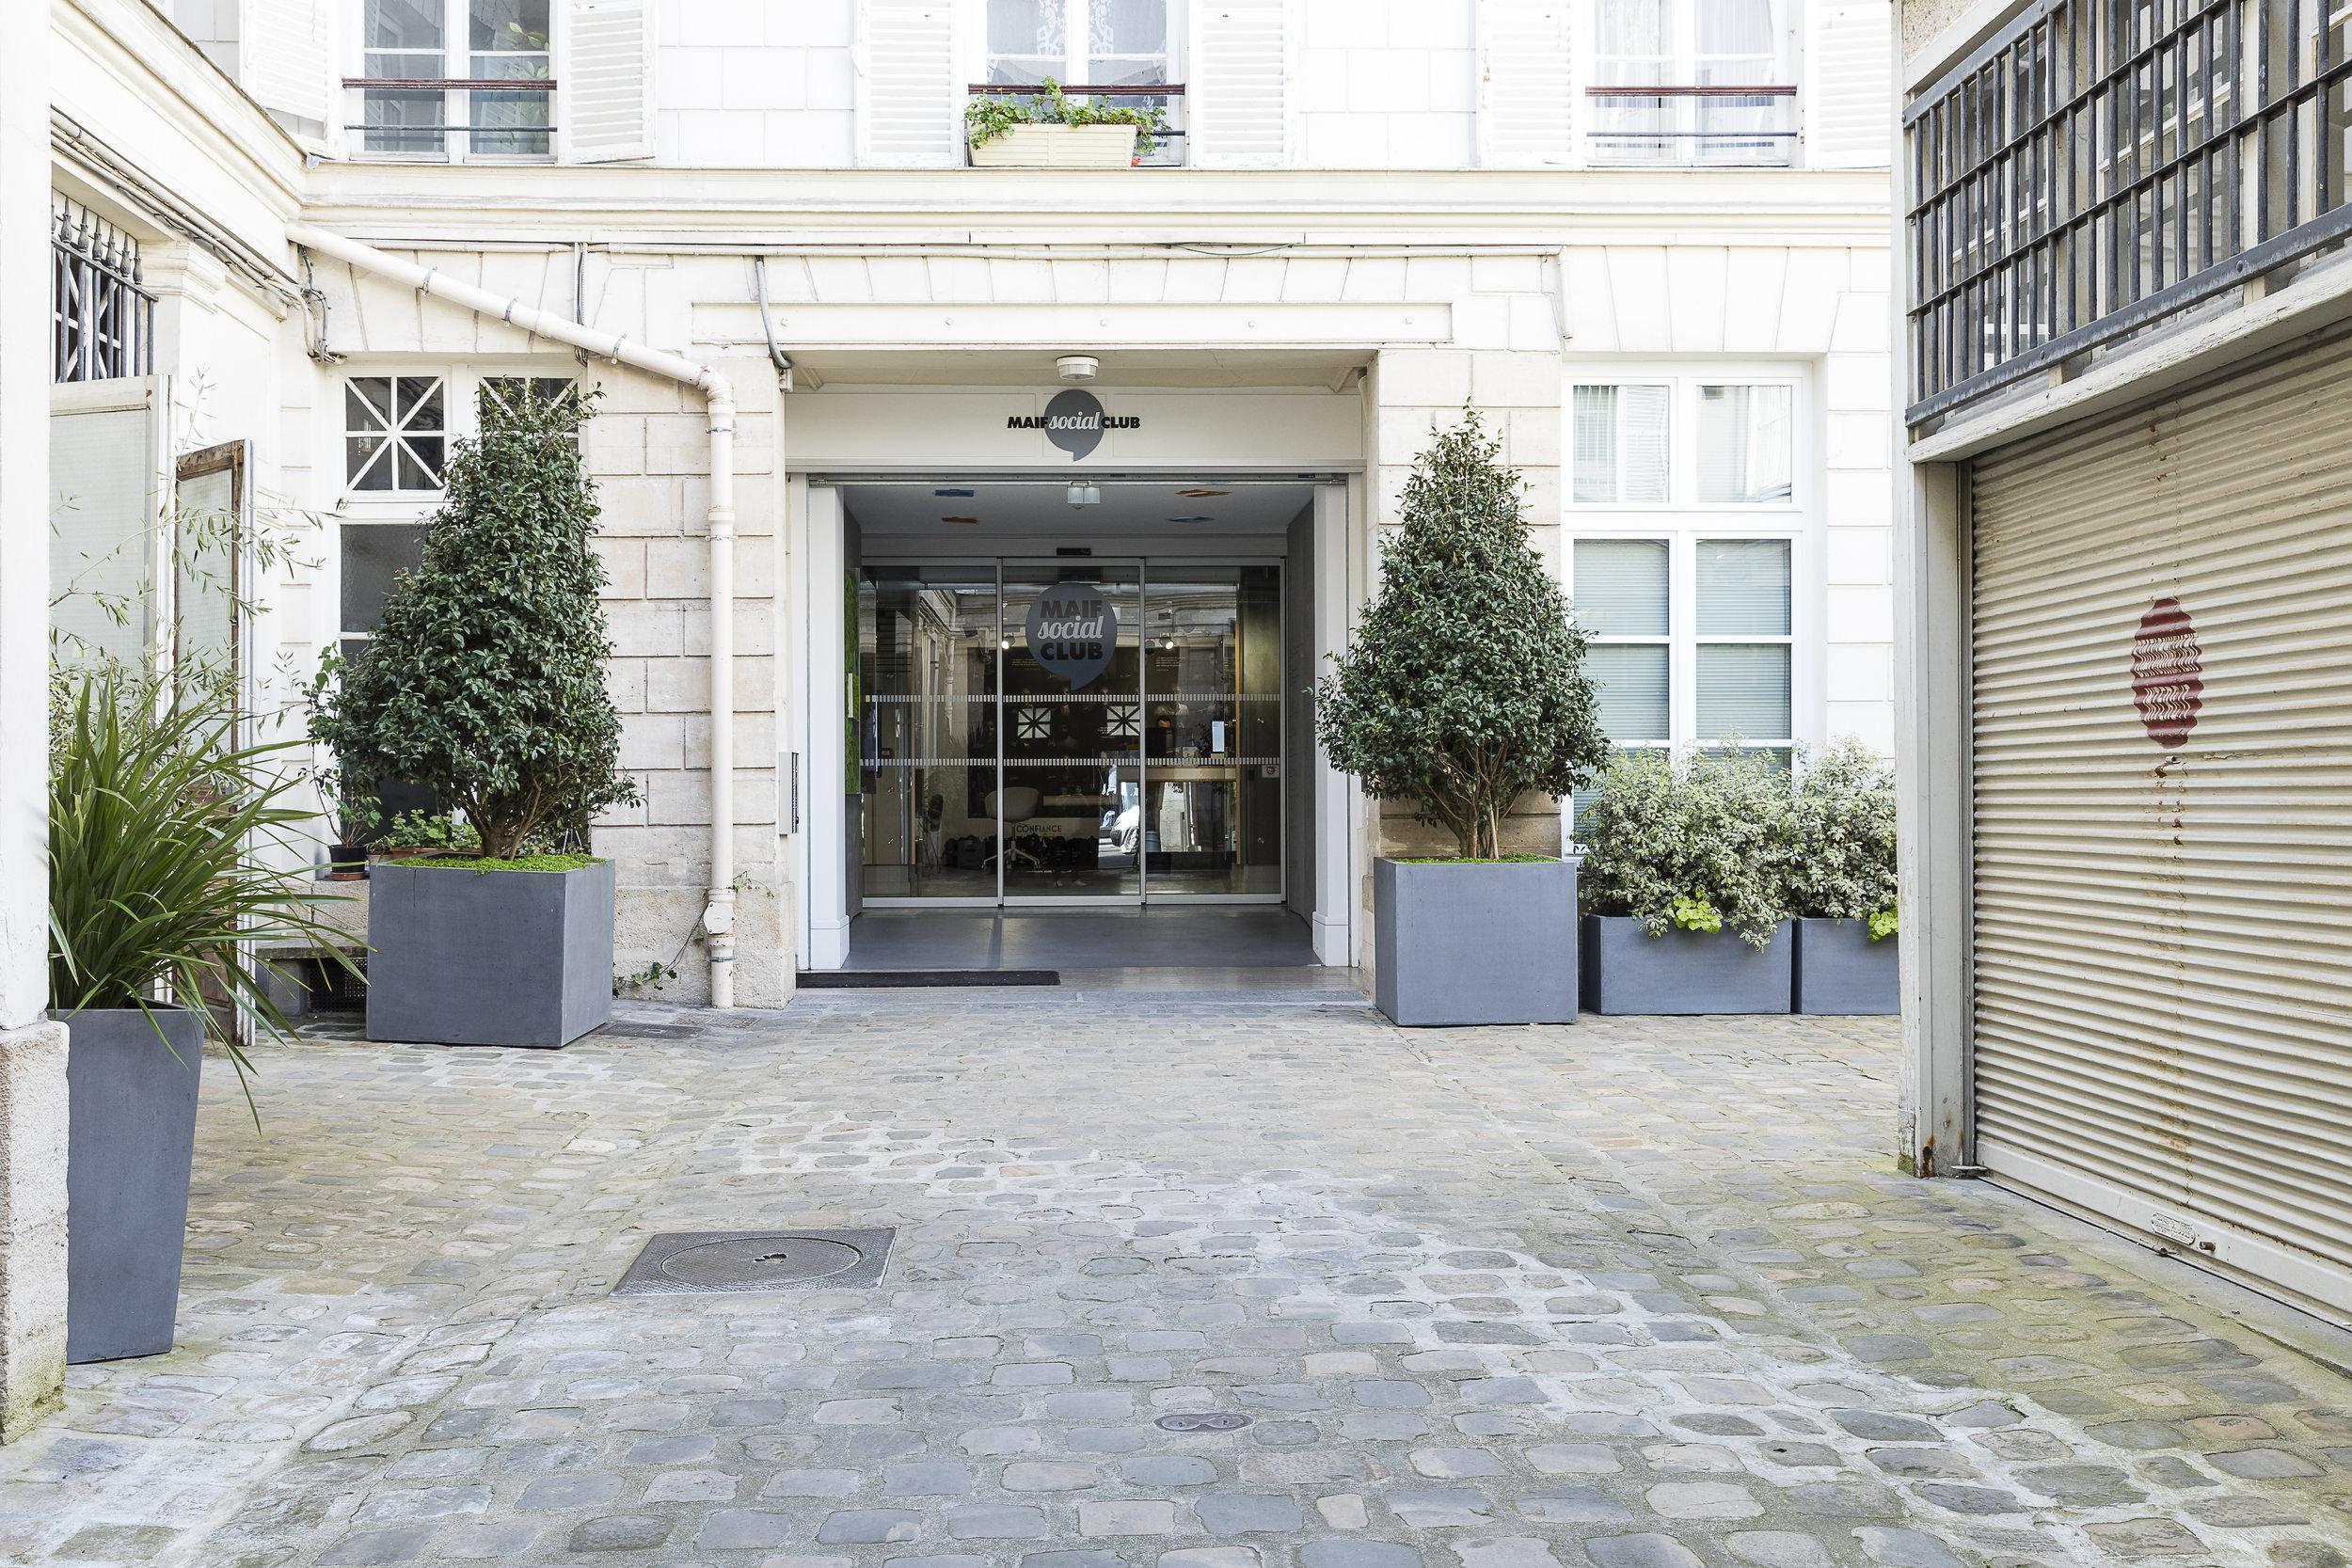 Maif Social Club - 37 rue de Turenne, 75003 Paris